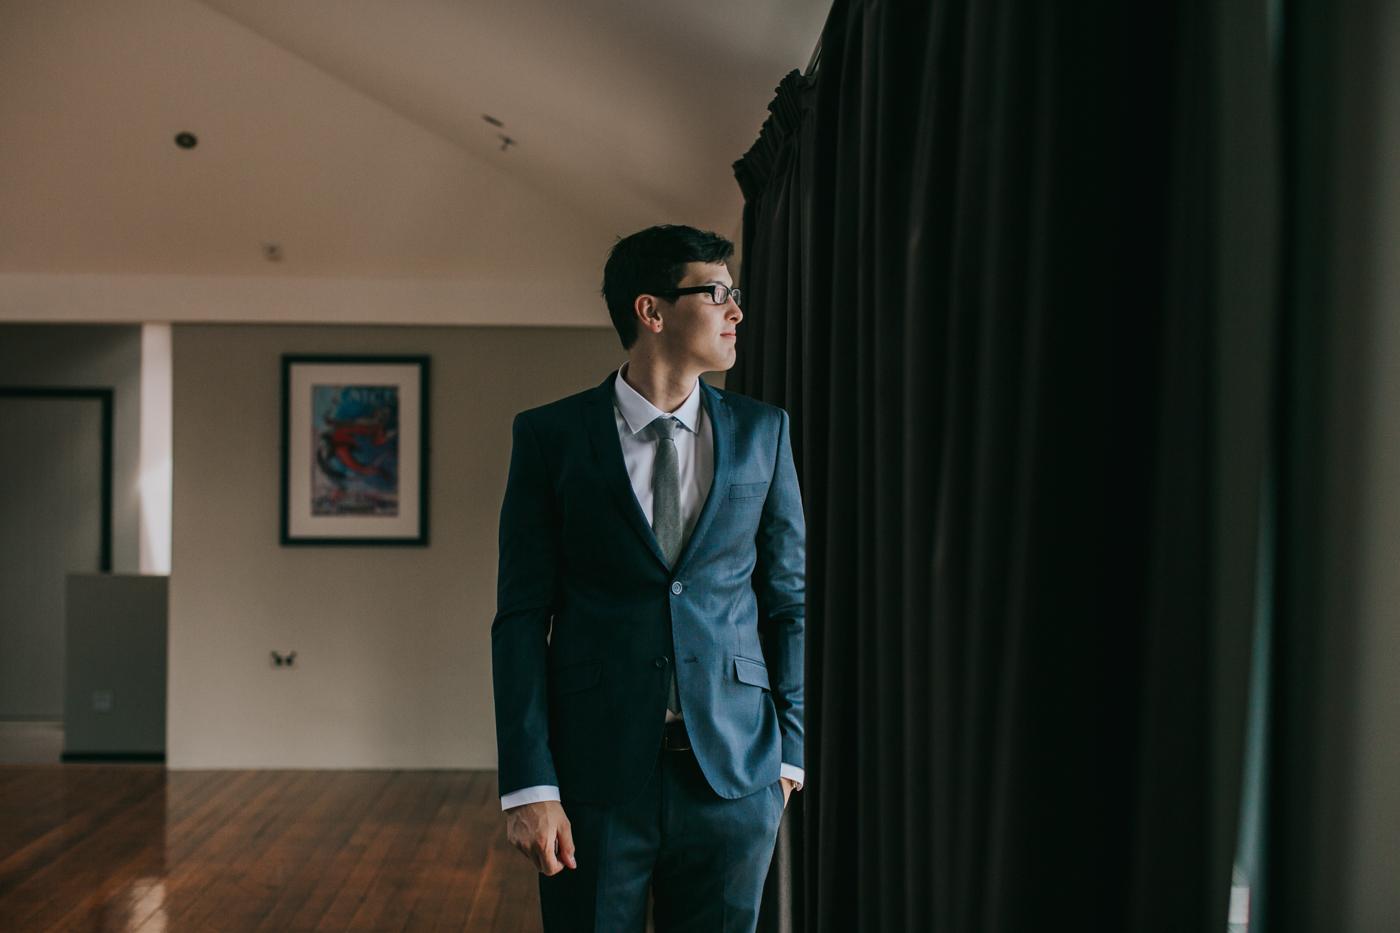 Ariana & Tim - Dunedin, New Zealand Wedding - Destination Wedding - Samantha Heather Photography-21.jpg